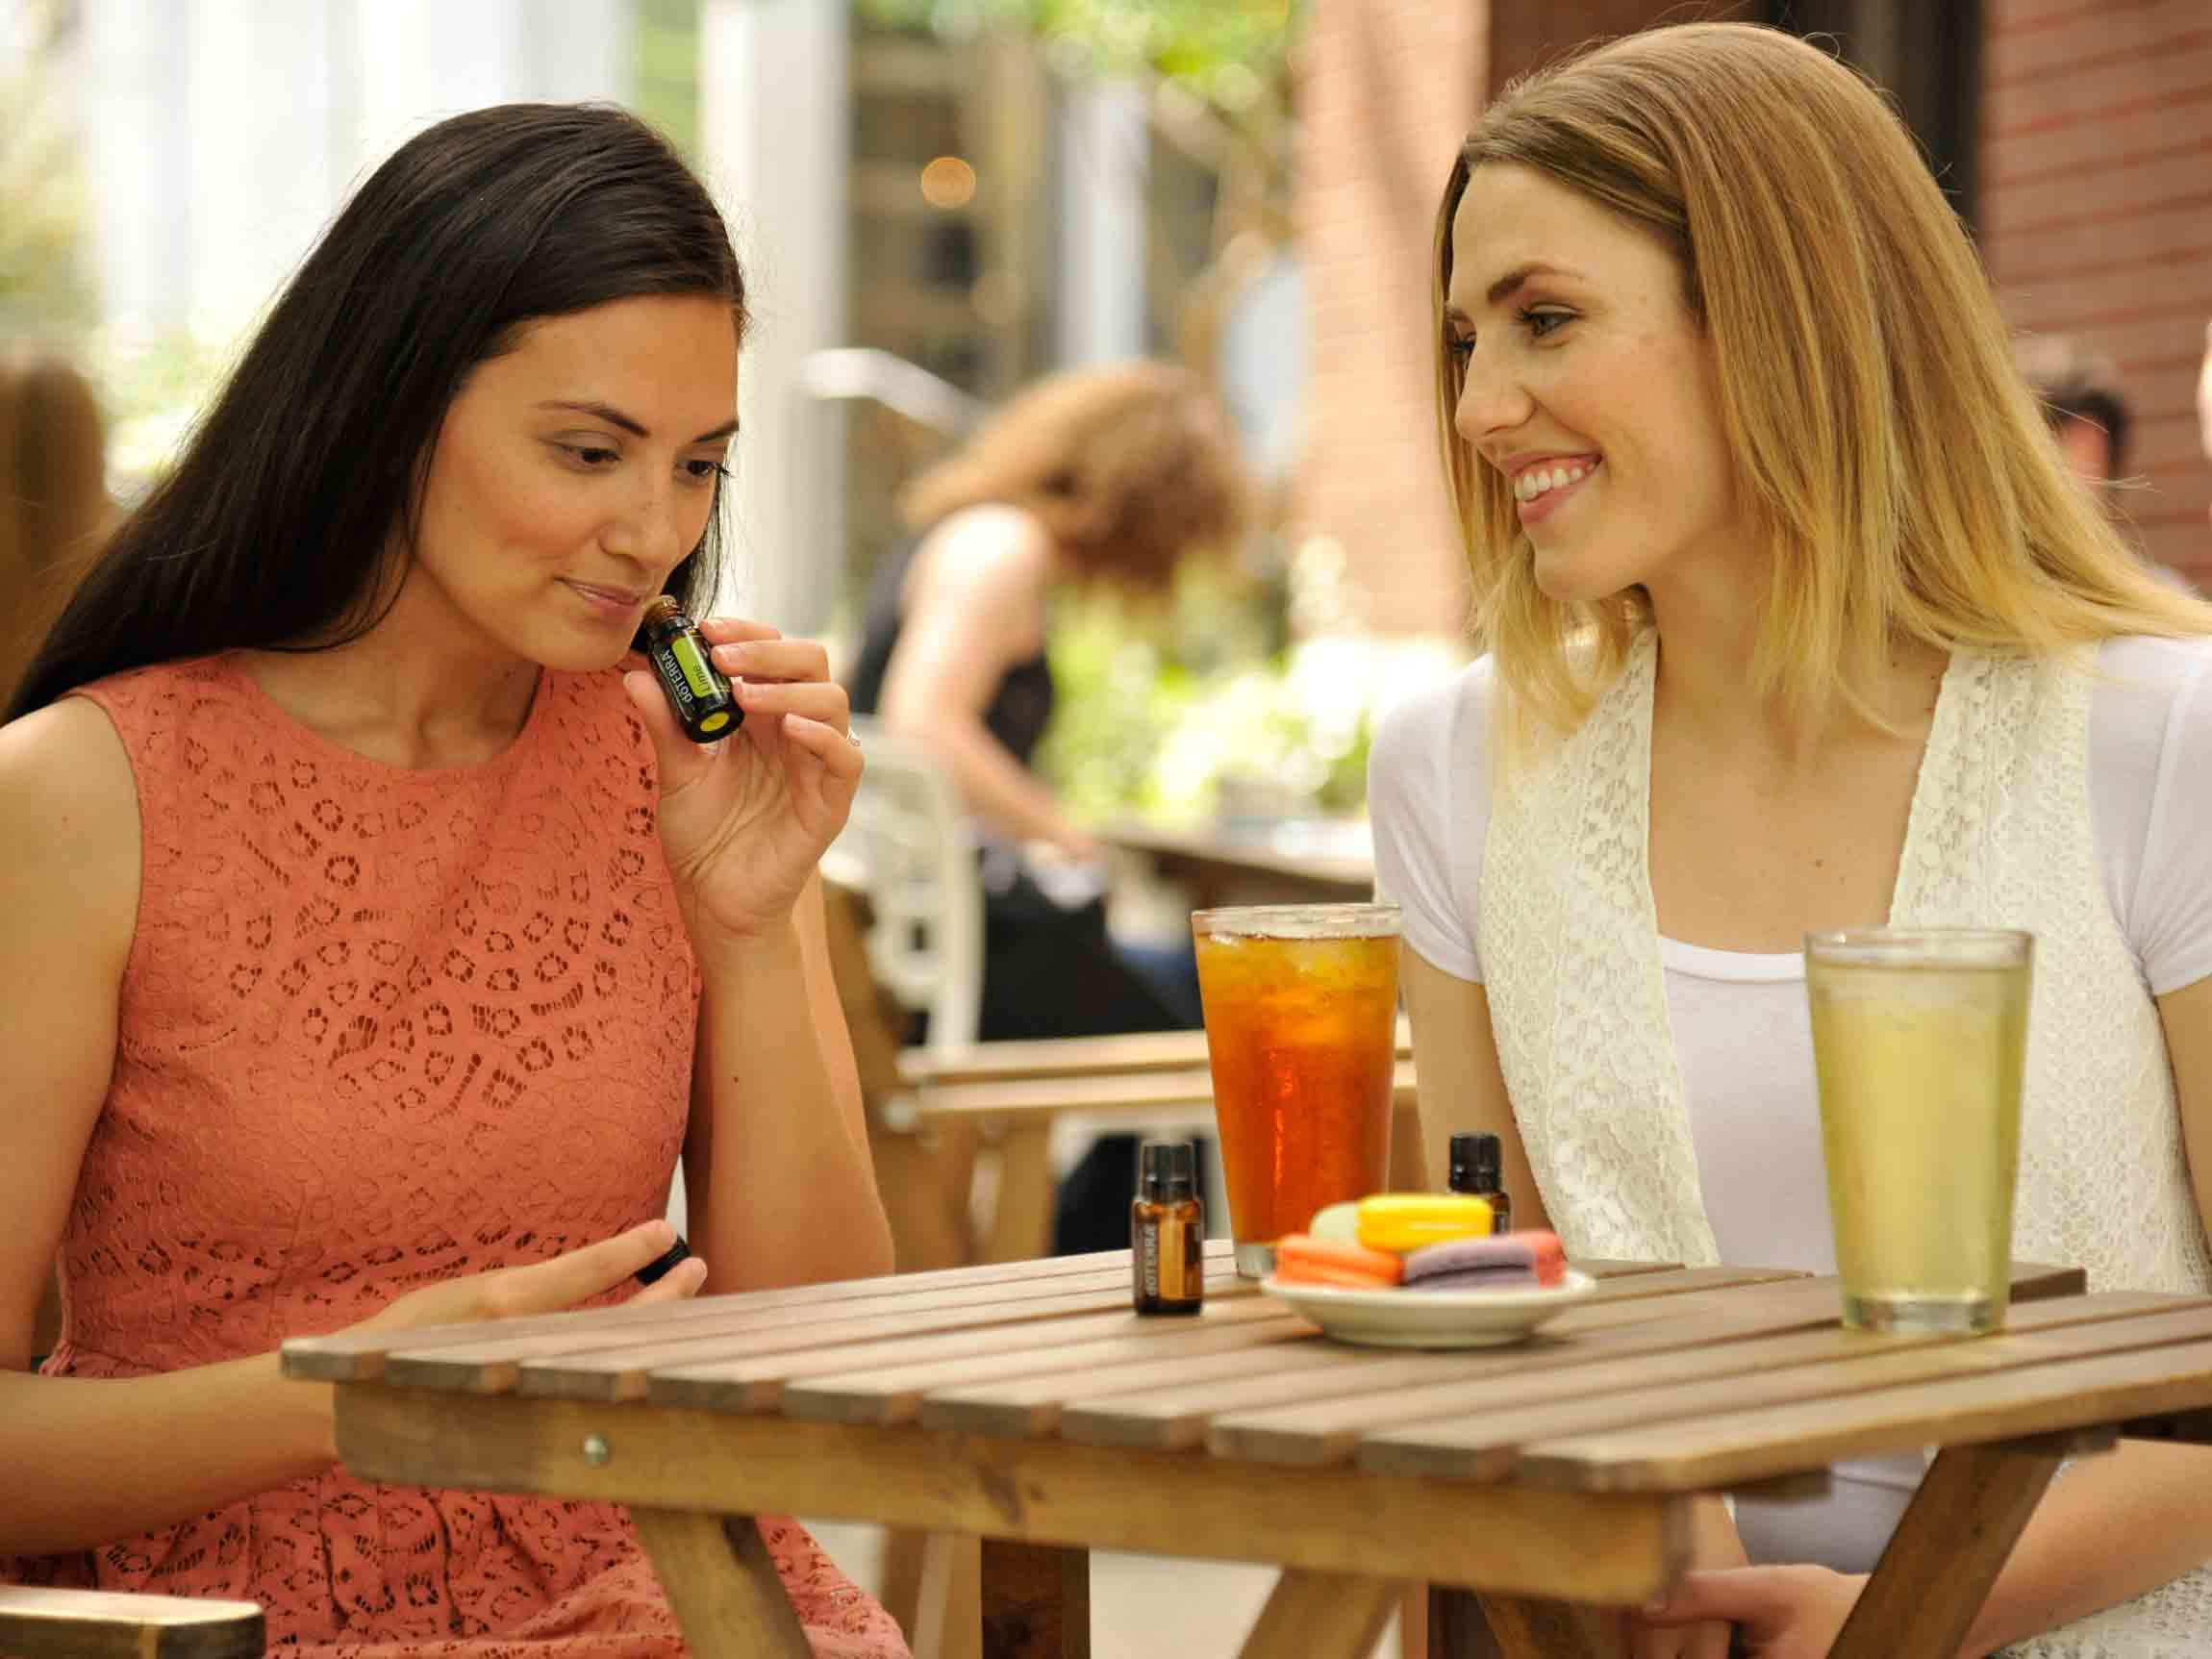 4x3-2300x1725-women-sharing-essential-oils_us_english_web.jpg